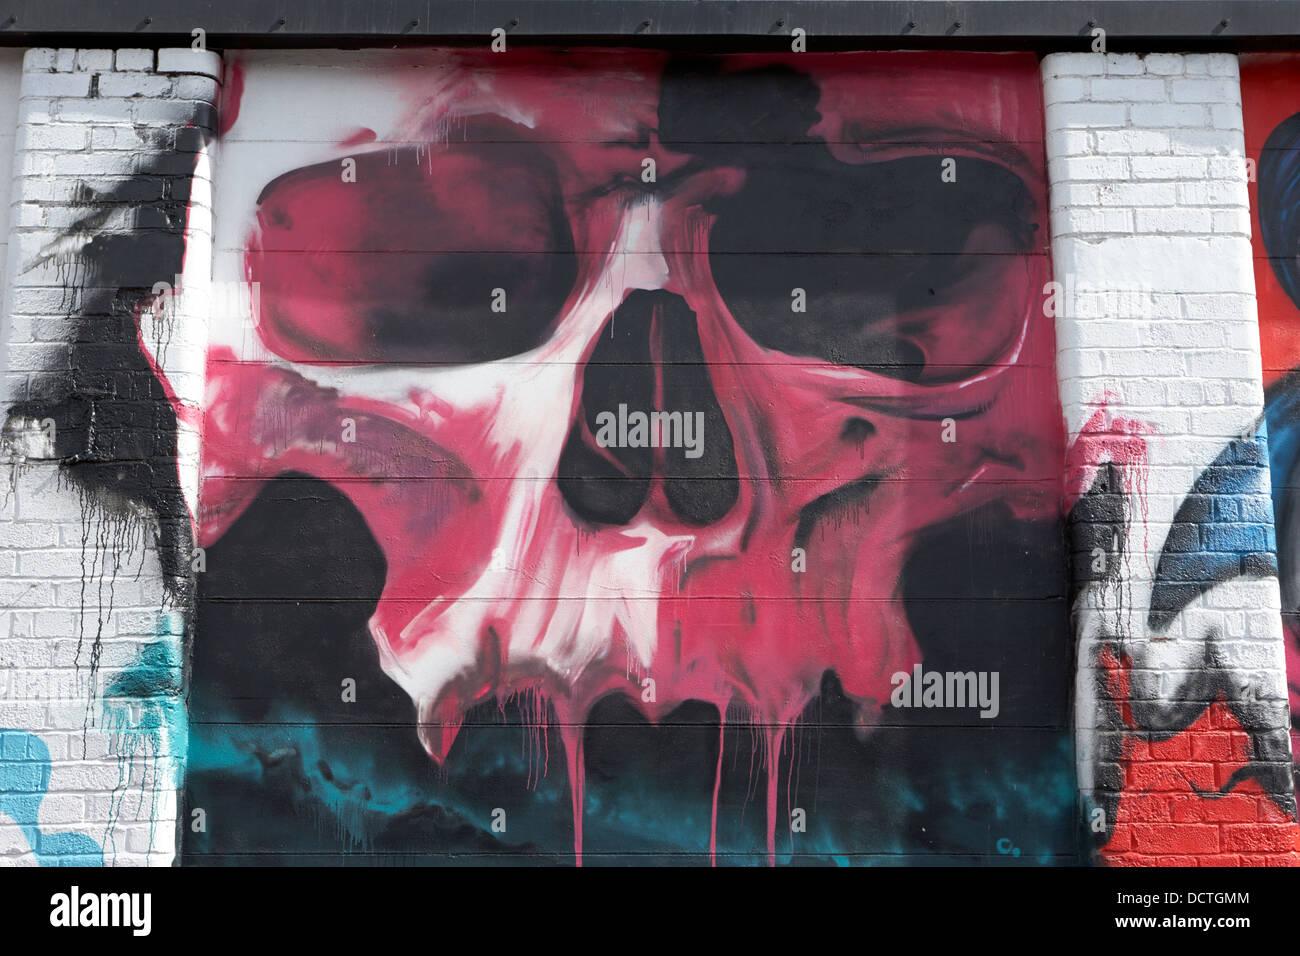 Graffiti wall uk - Stock Photo Dripping Skull Graffiti Wall Art In Belfast Northern Ireland Uk